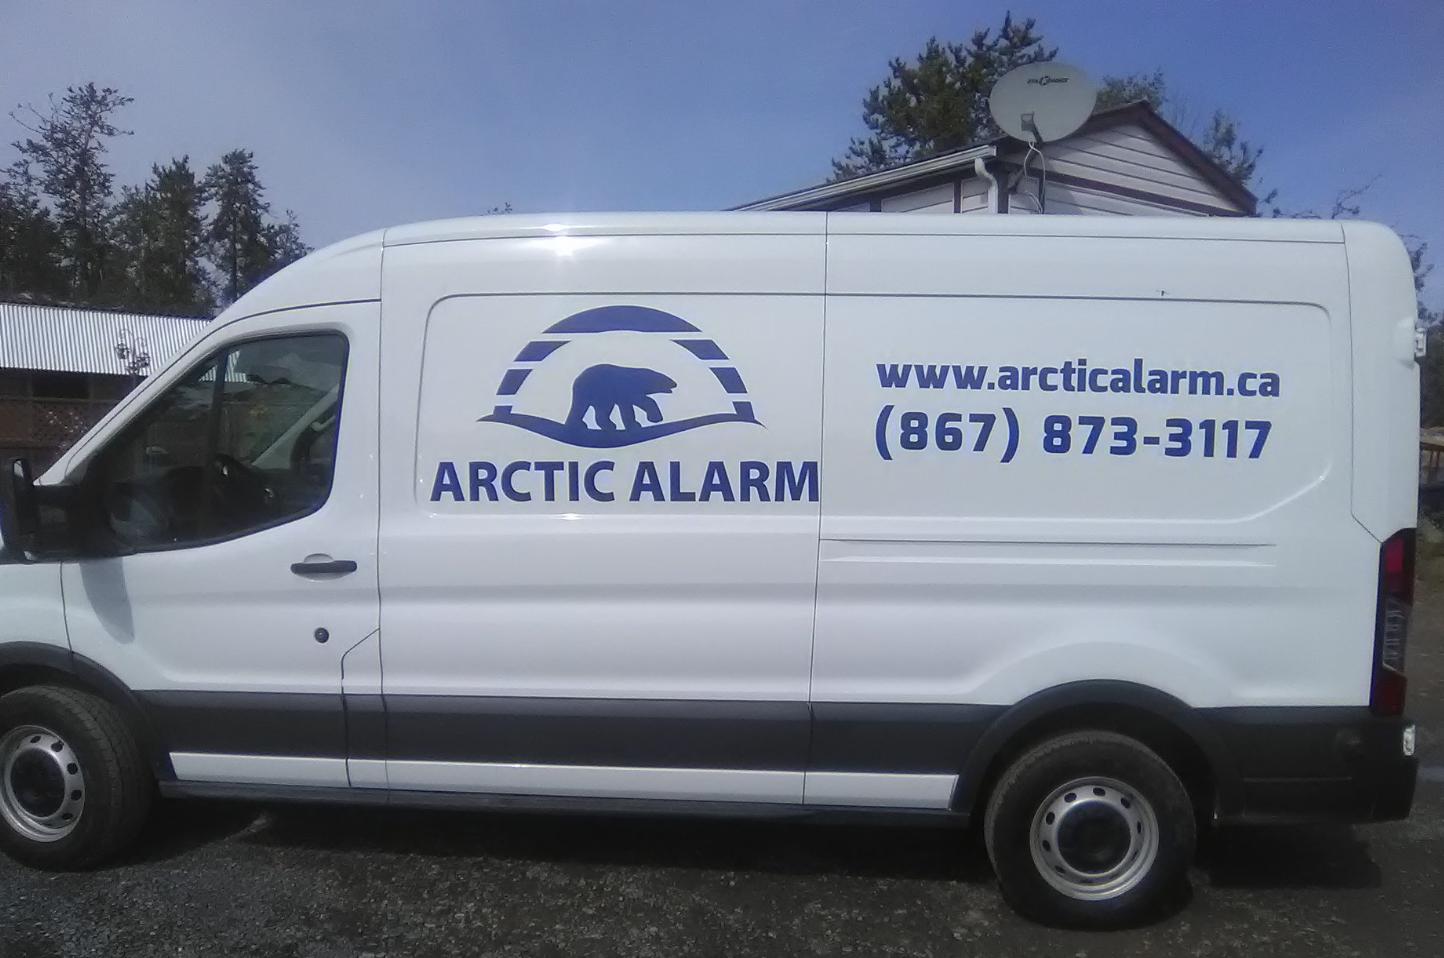 Arctic Alarm Commercial Vehicle Decals